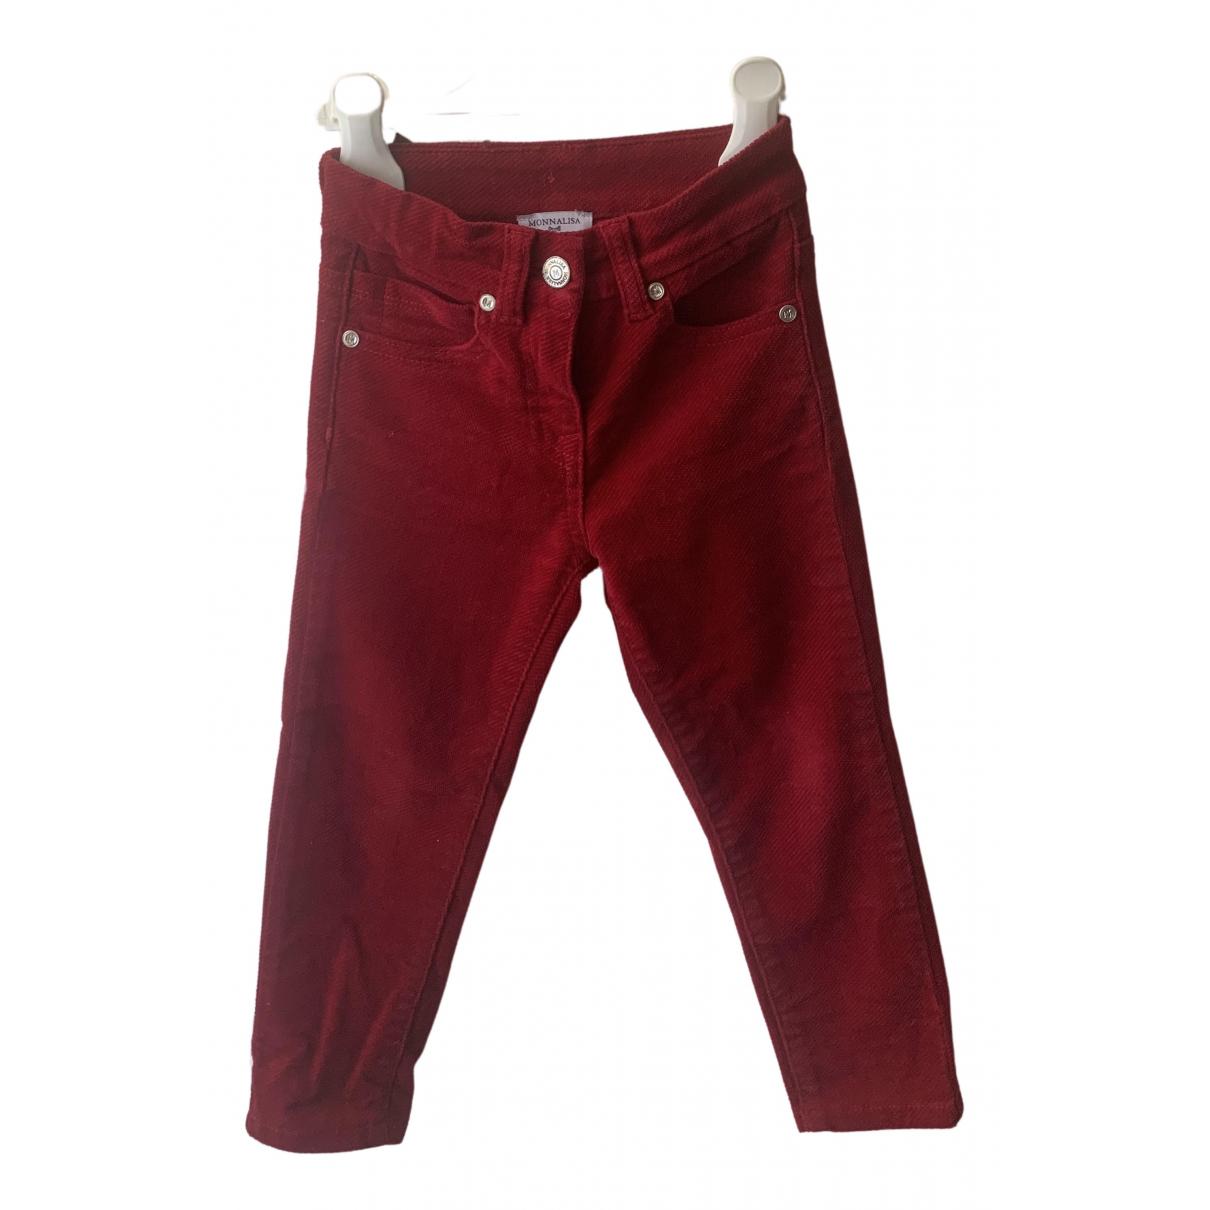 Monnalisa N Burgundy Velvet Trousers for Kids 4 years - until 40 inches UK